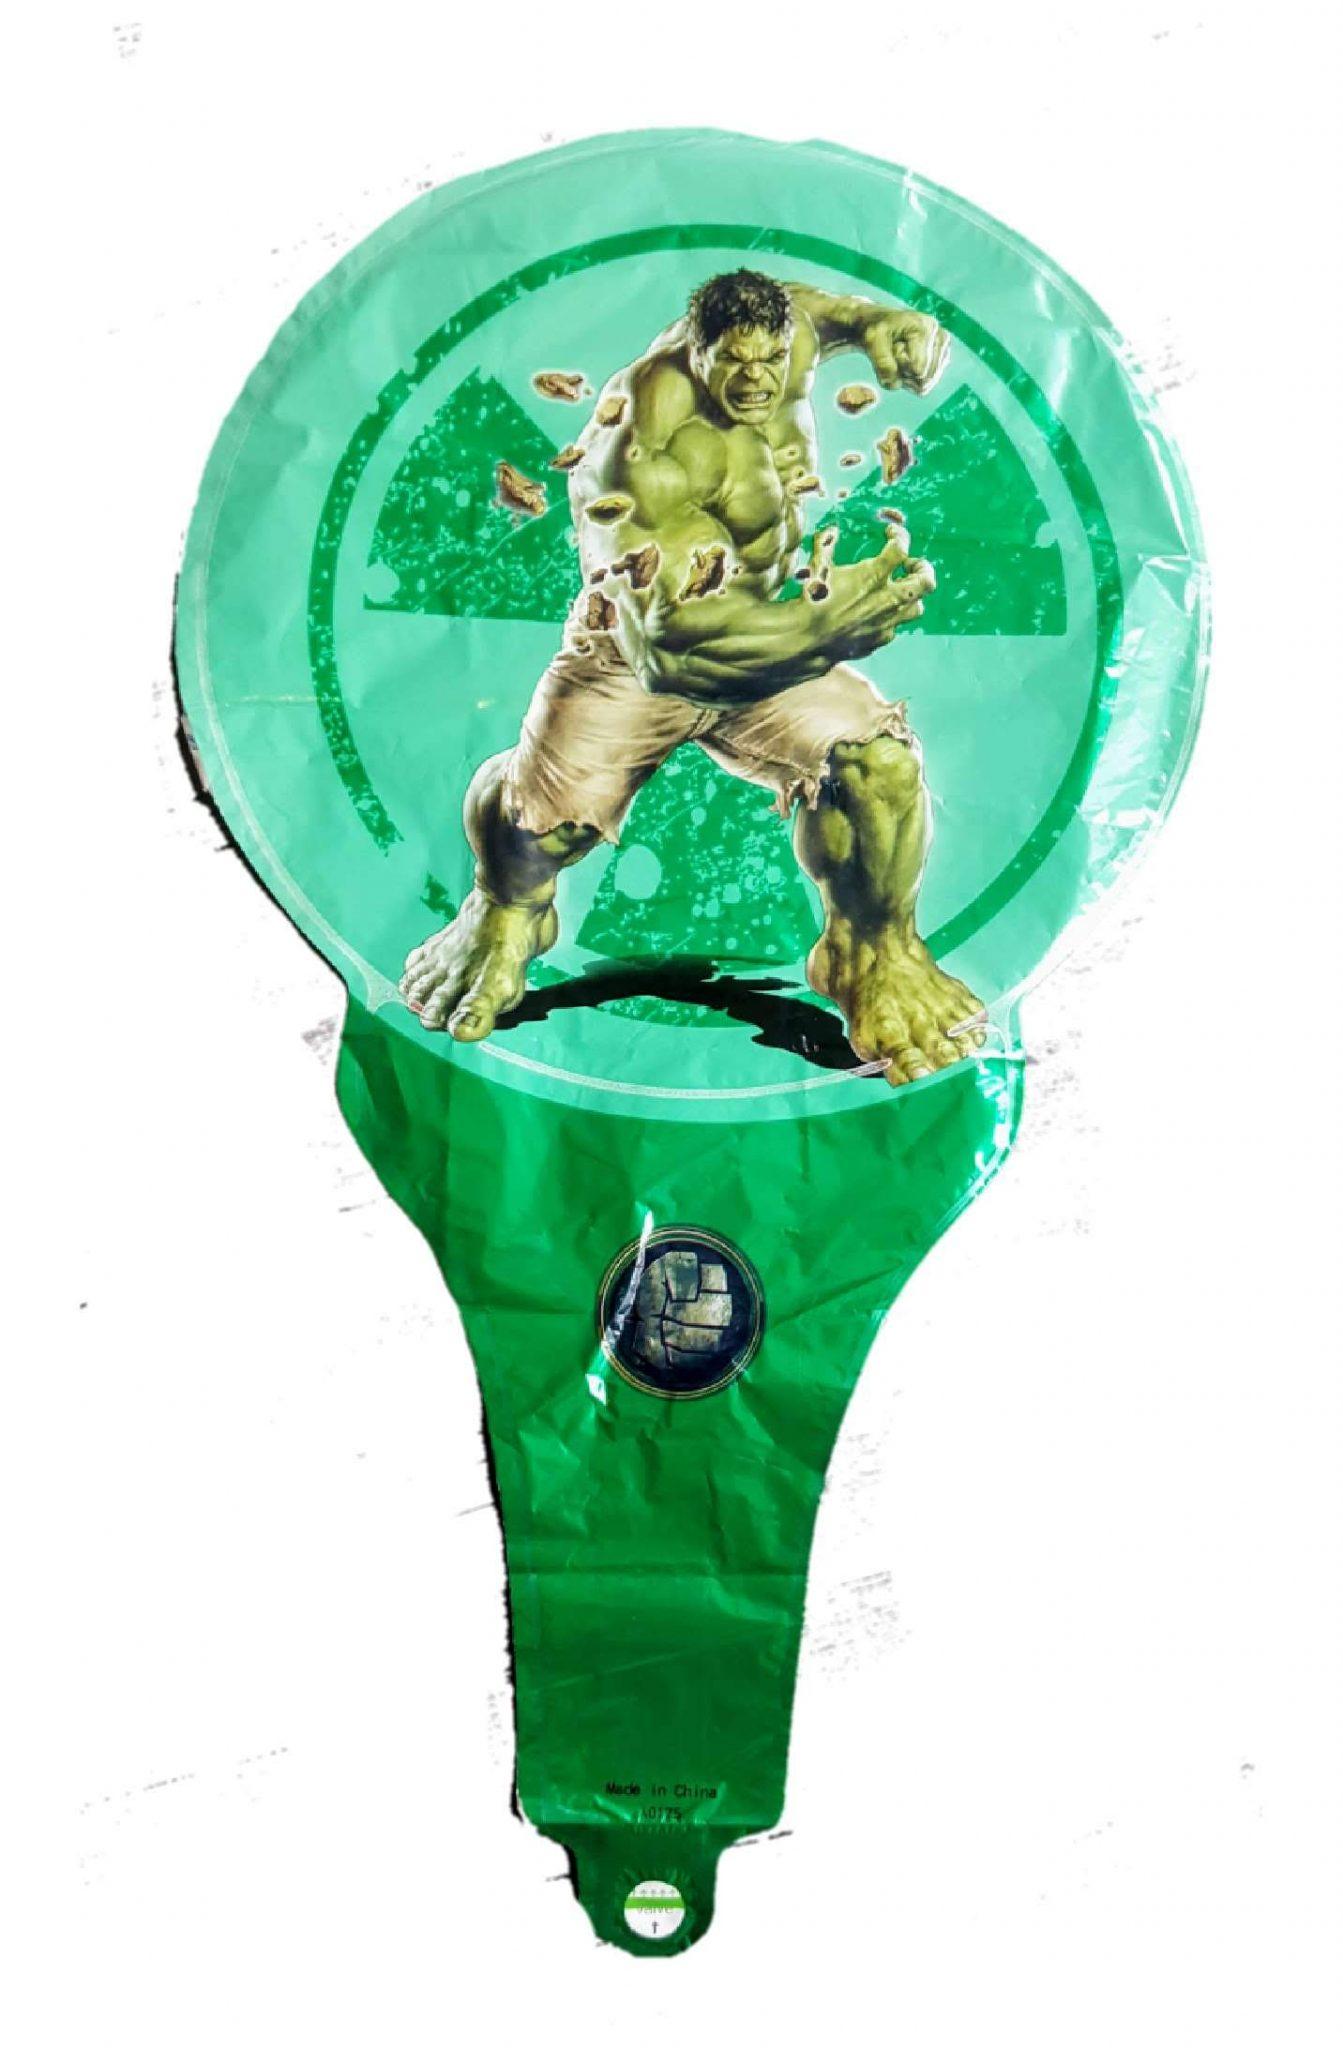 hulk superhero handheld foil balloon